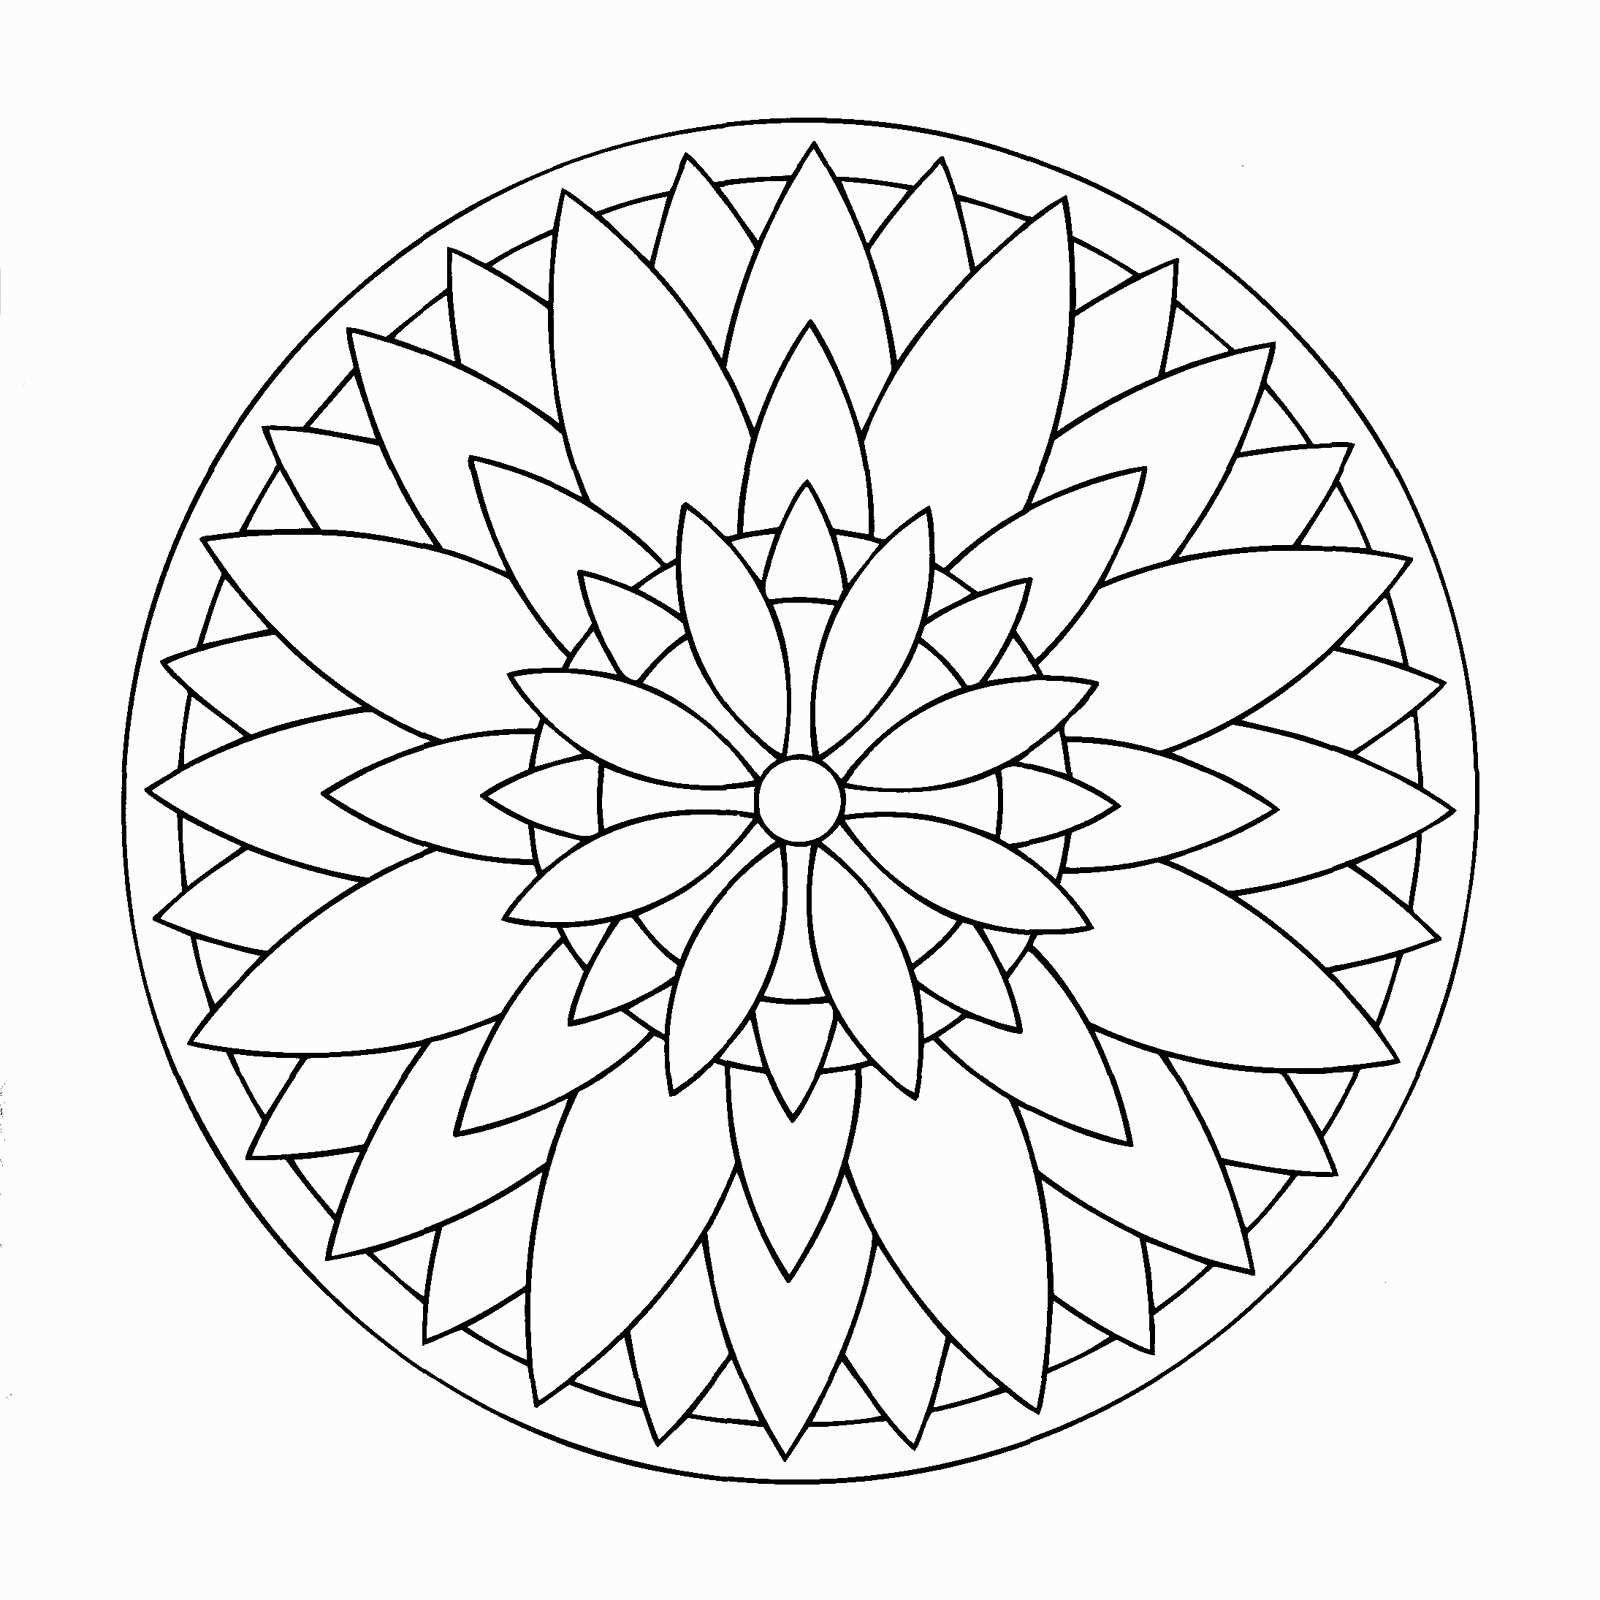 Frisch Dessins Mandala À Imprimer #färbung #malvorlagen destiné Rosace A Imprimer